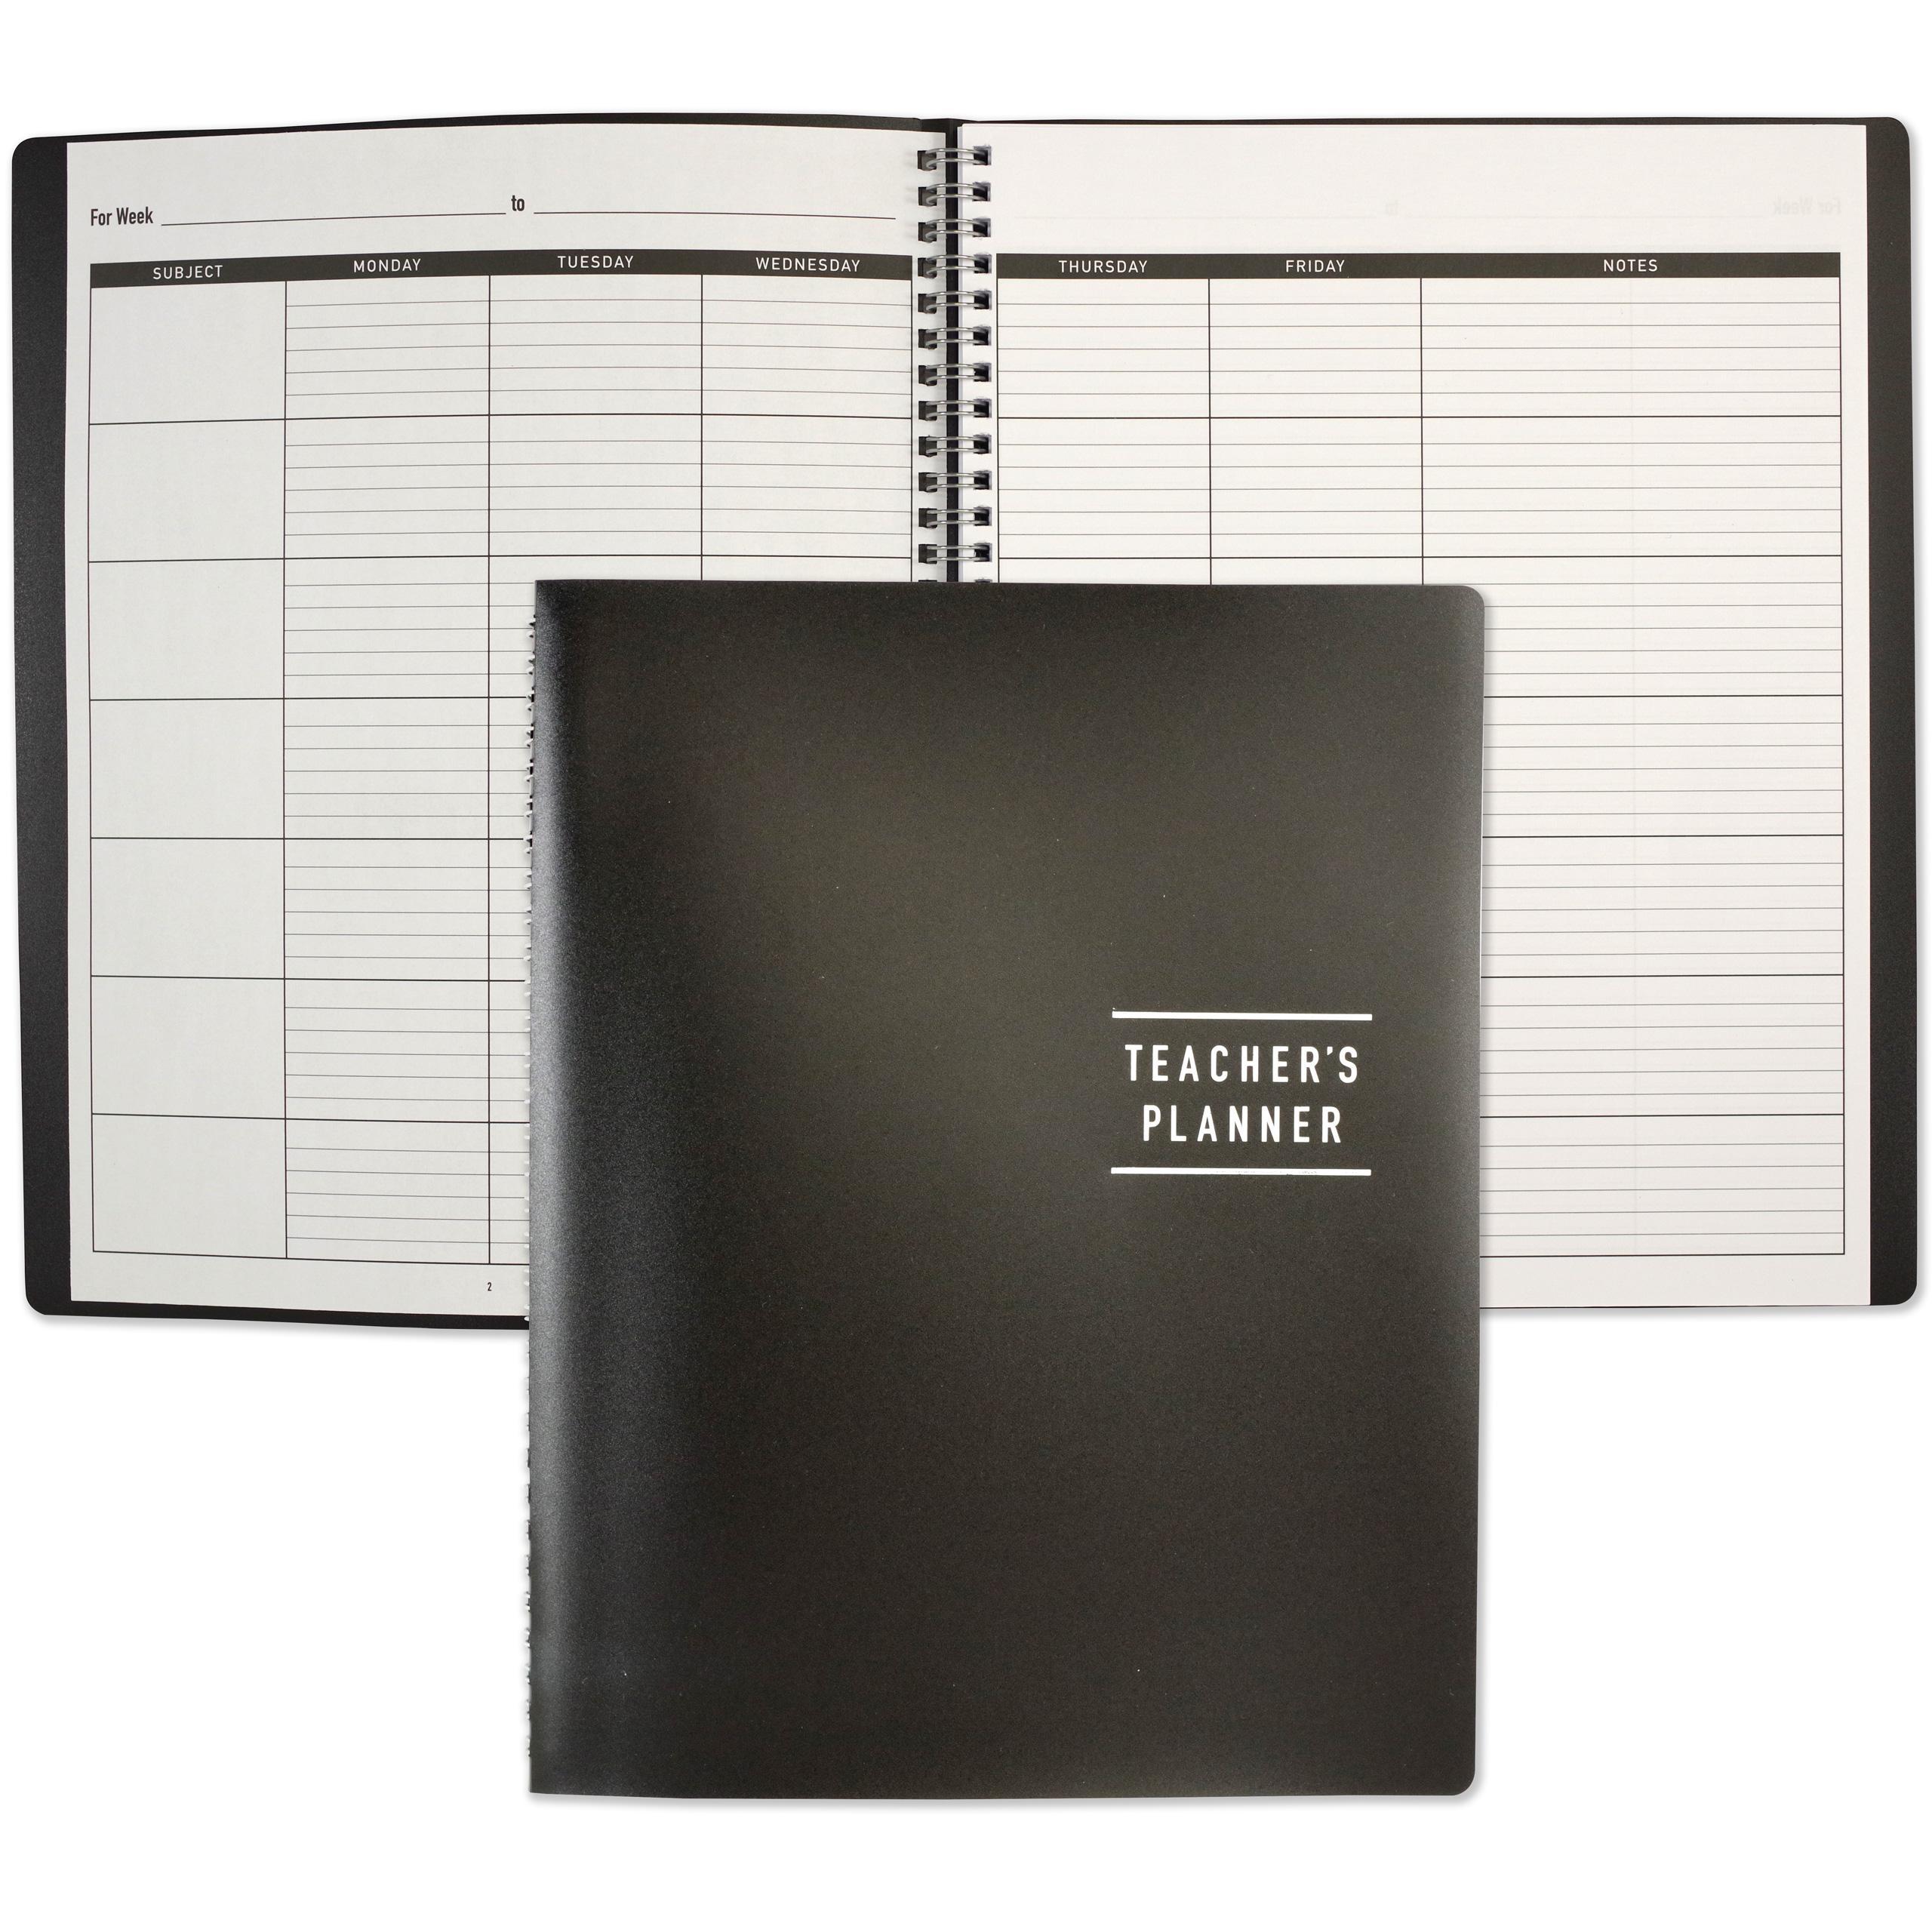 Teachers Planner (Lesson Planner): Peter Pauper Press ...